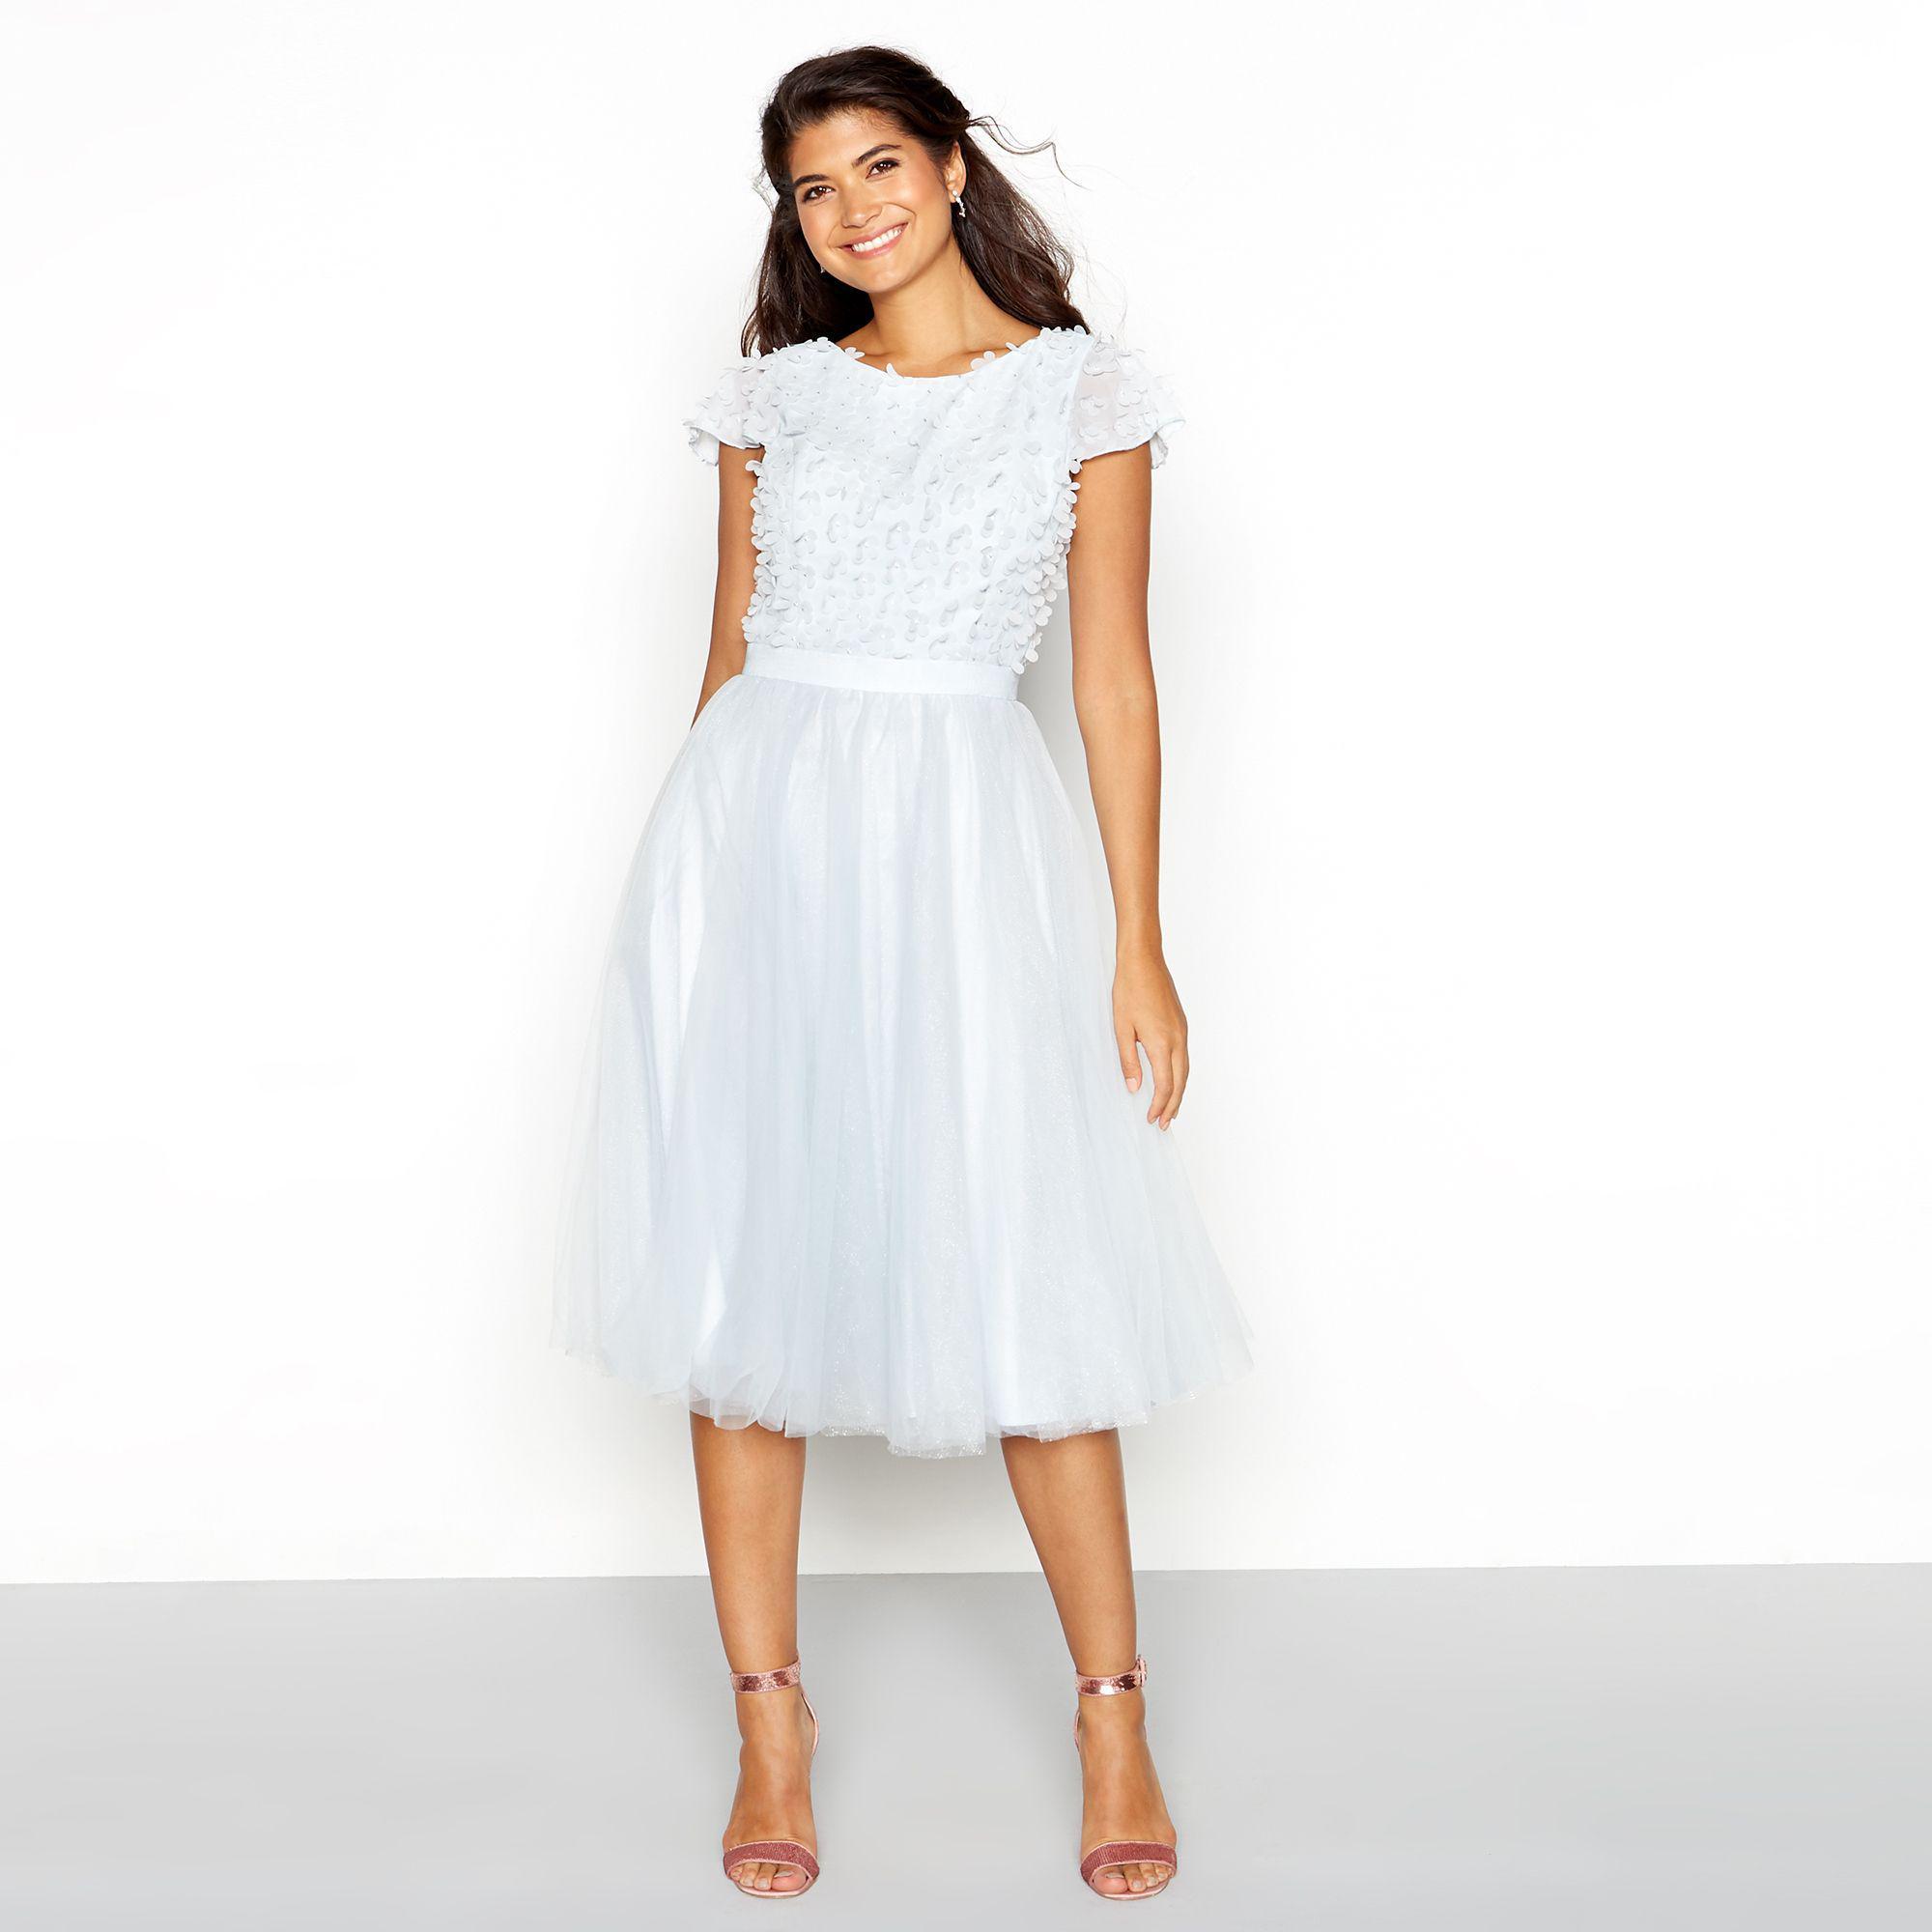 Short Sleeve Knee Length Dress